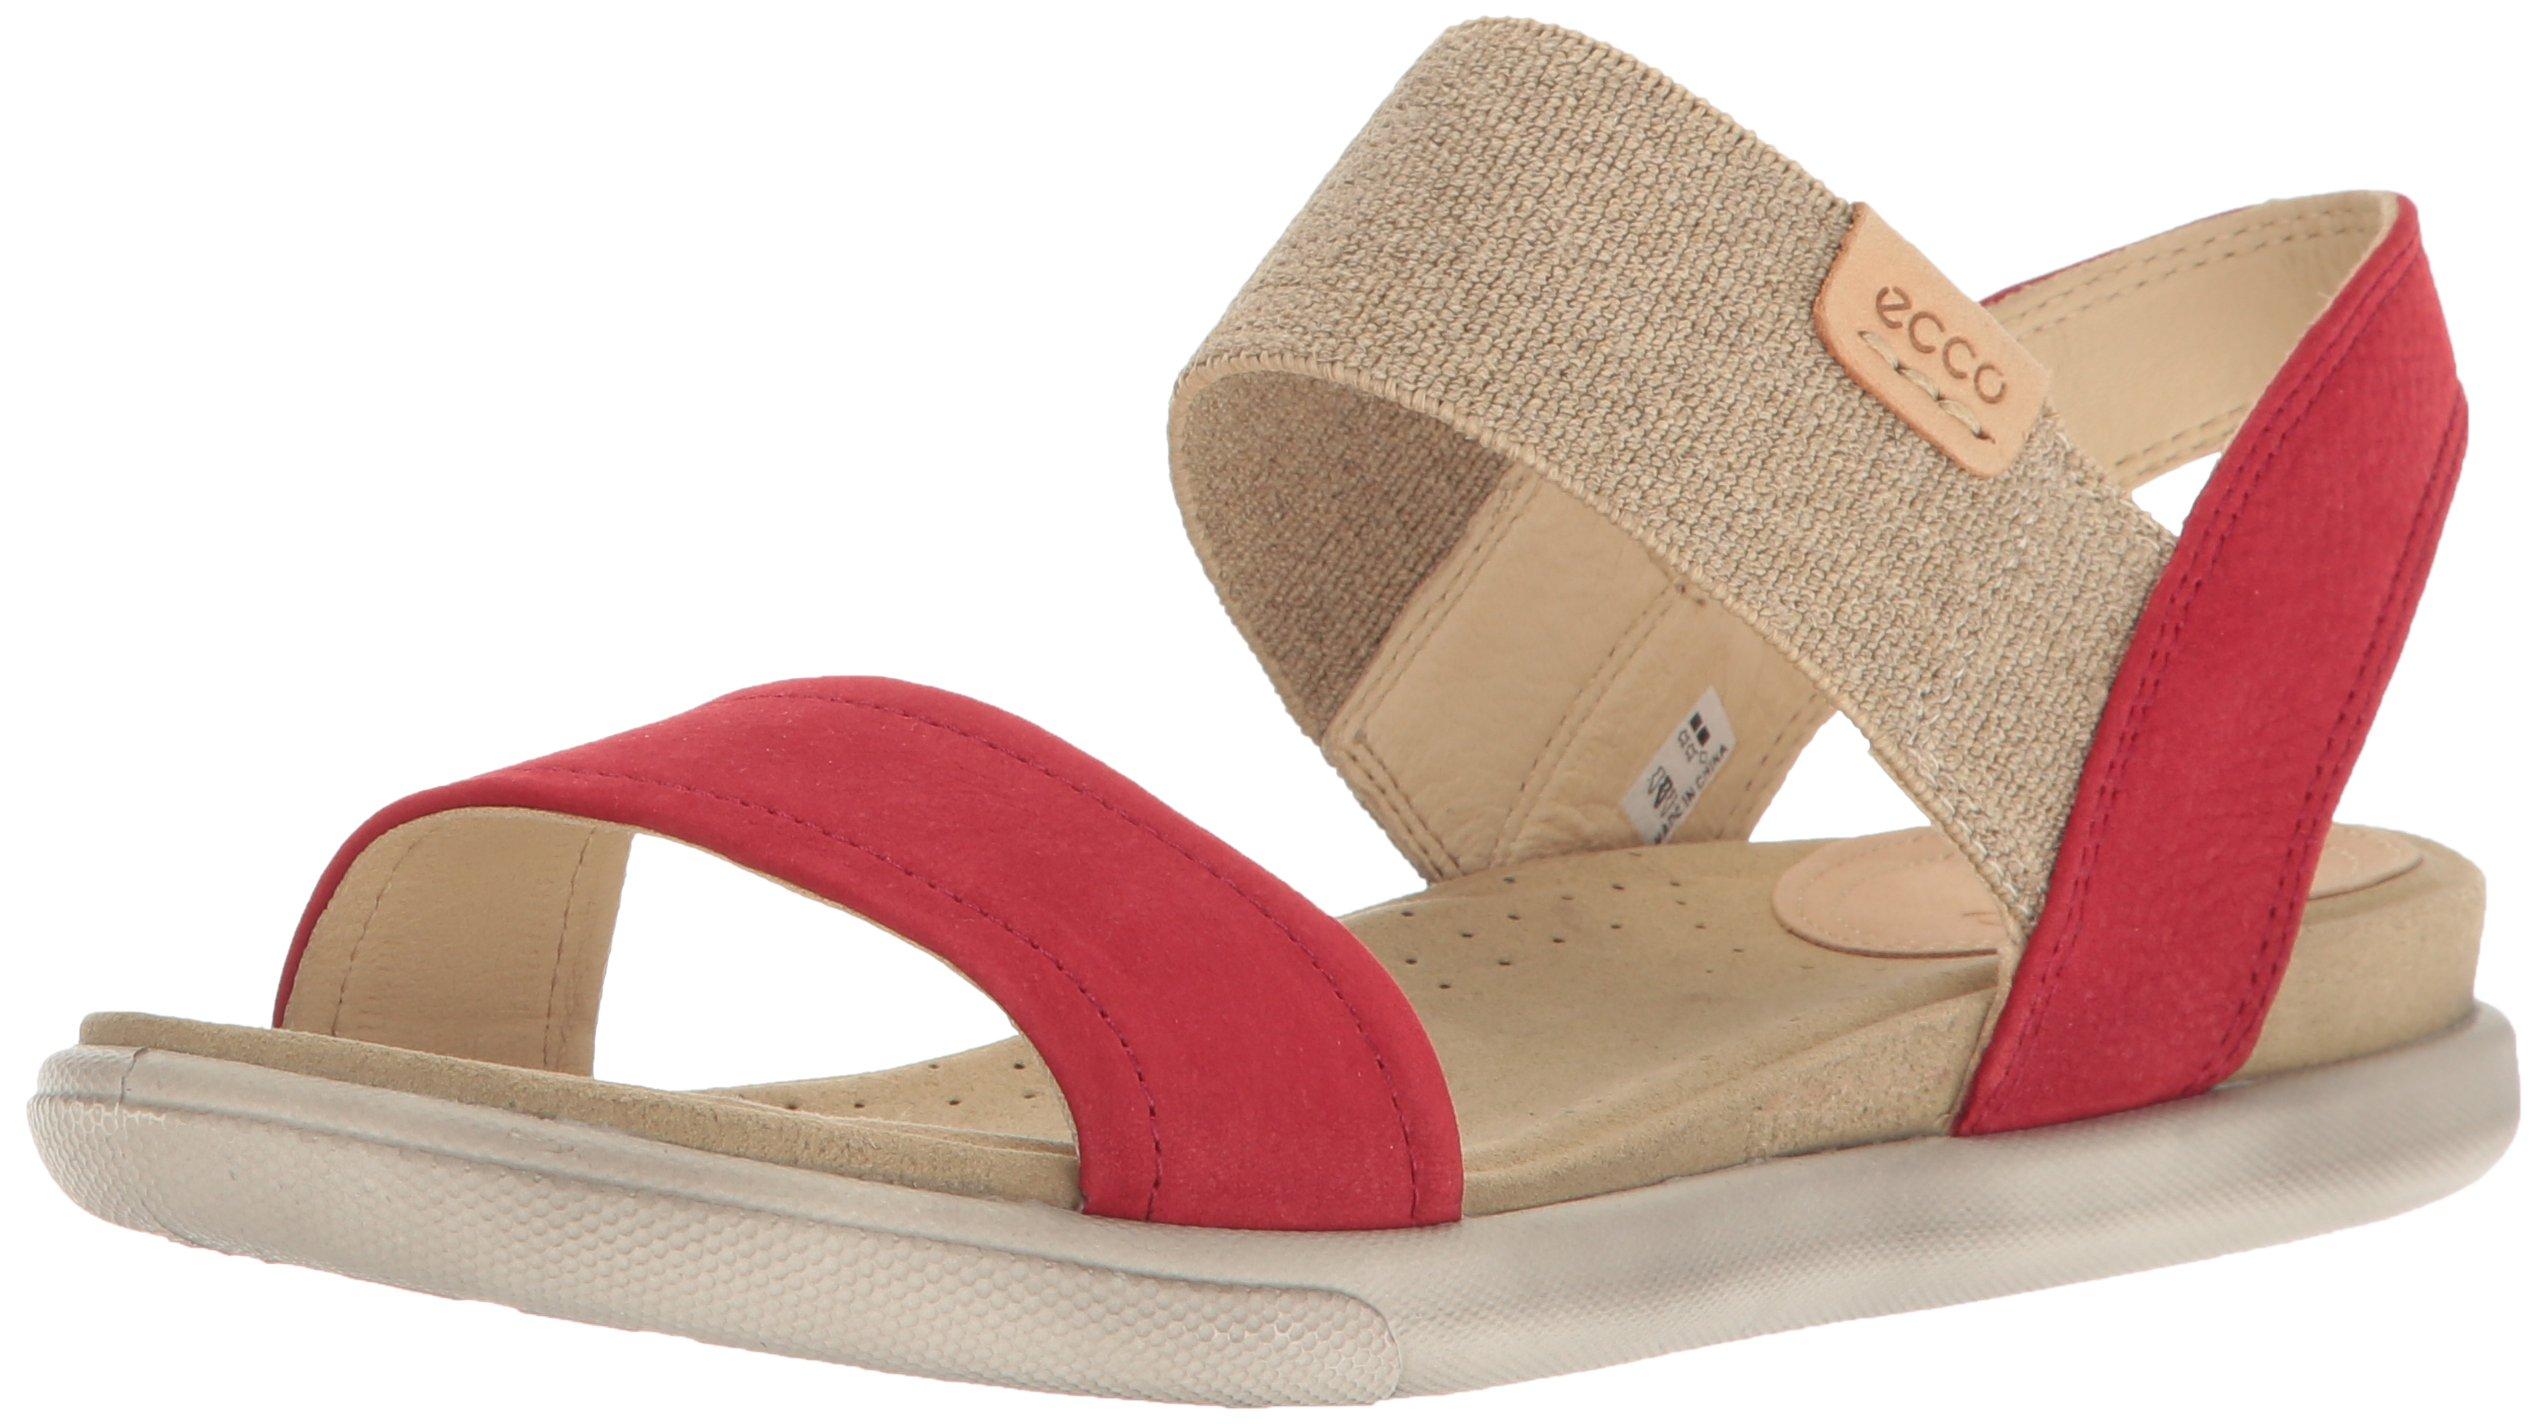 ECCO Women's Women's Damara Ankle Gladiator Sandal, Chili Red/Powder, 38 EU/7-7.5 US